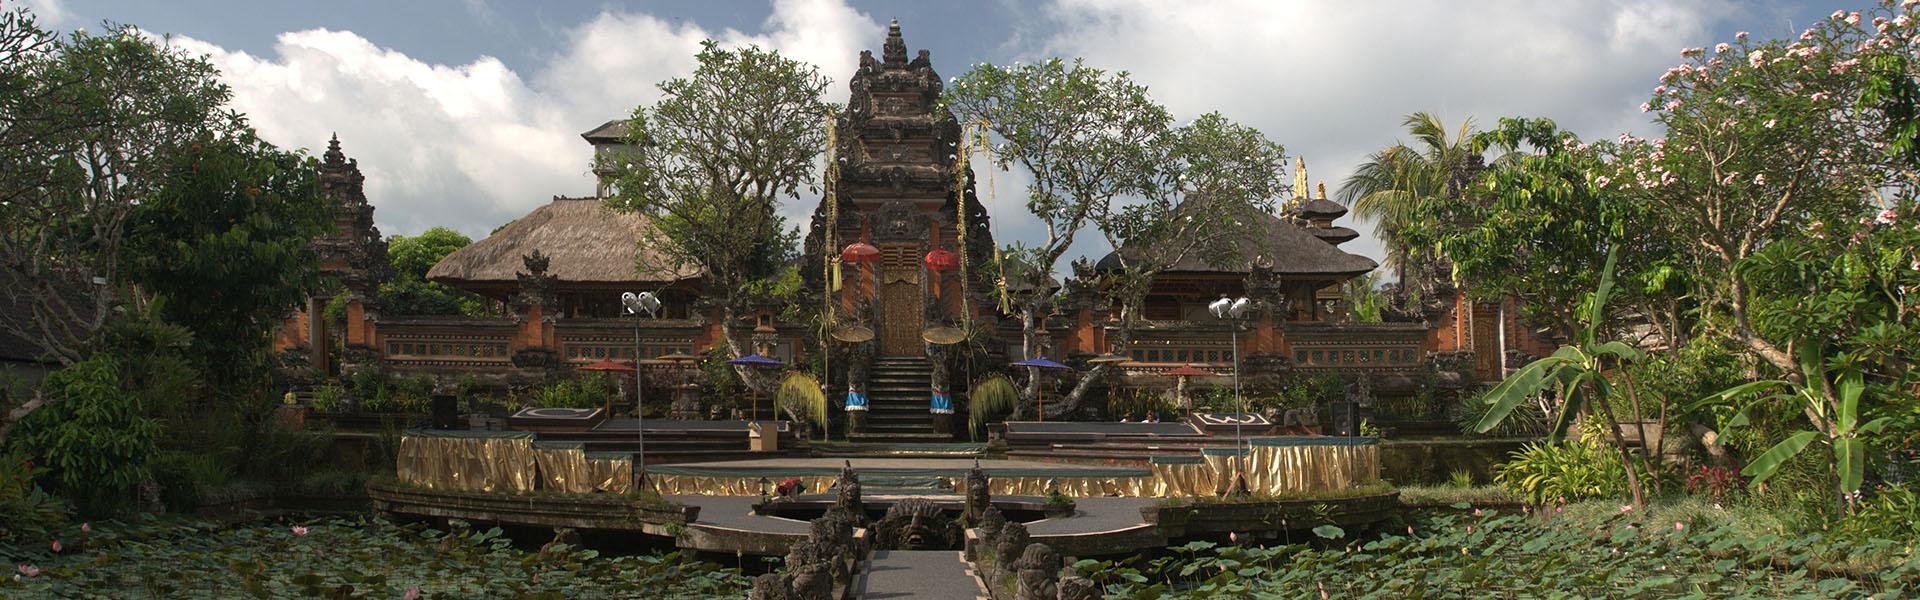 Pura Taman Saraswati Ubud Bali Indonesia 1920x600 - Bali - 20.10.2017